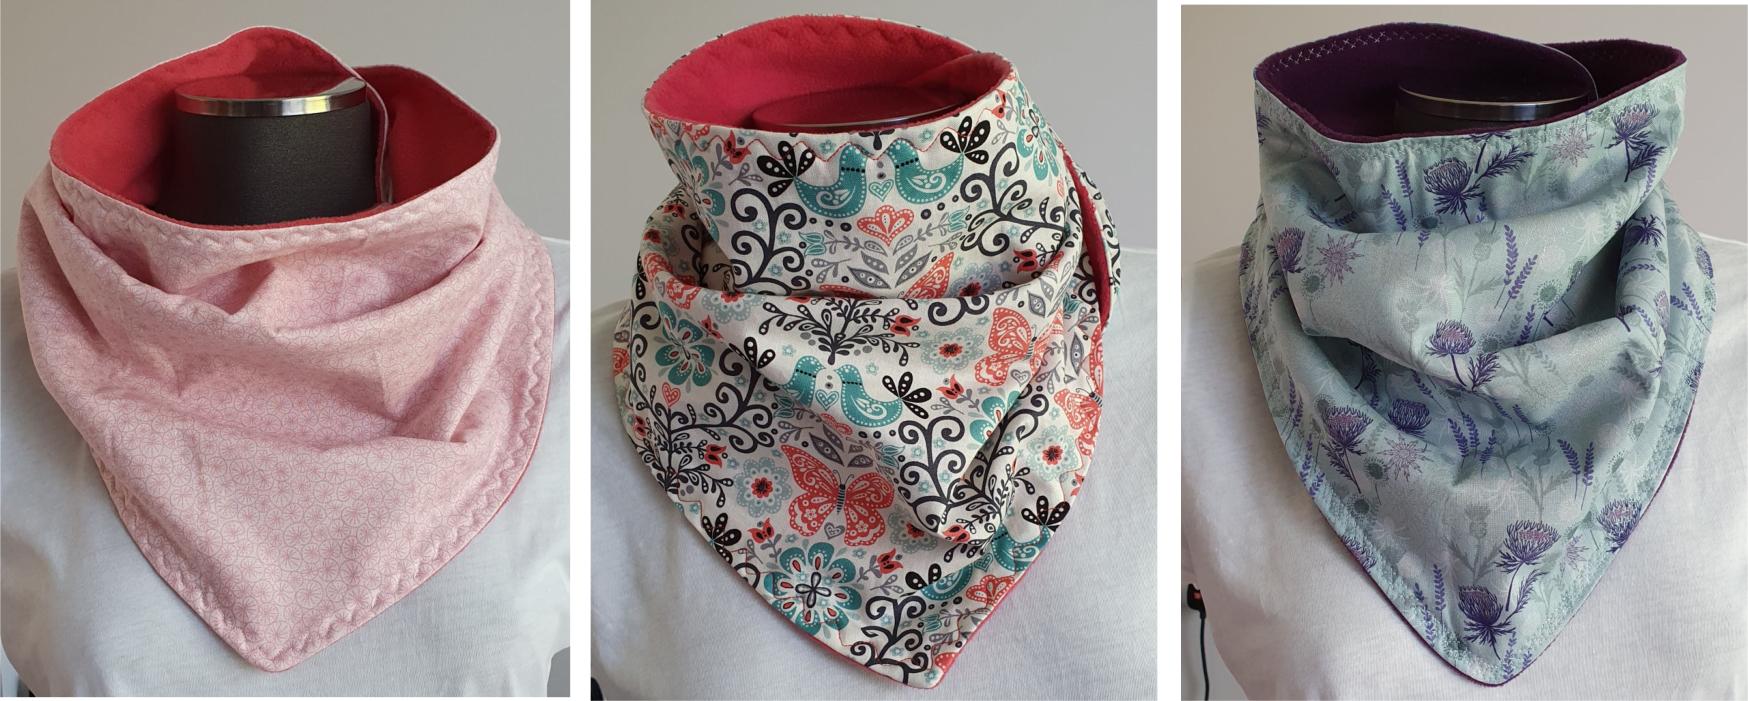 Ways to wear your scarf 1